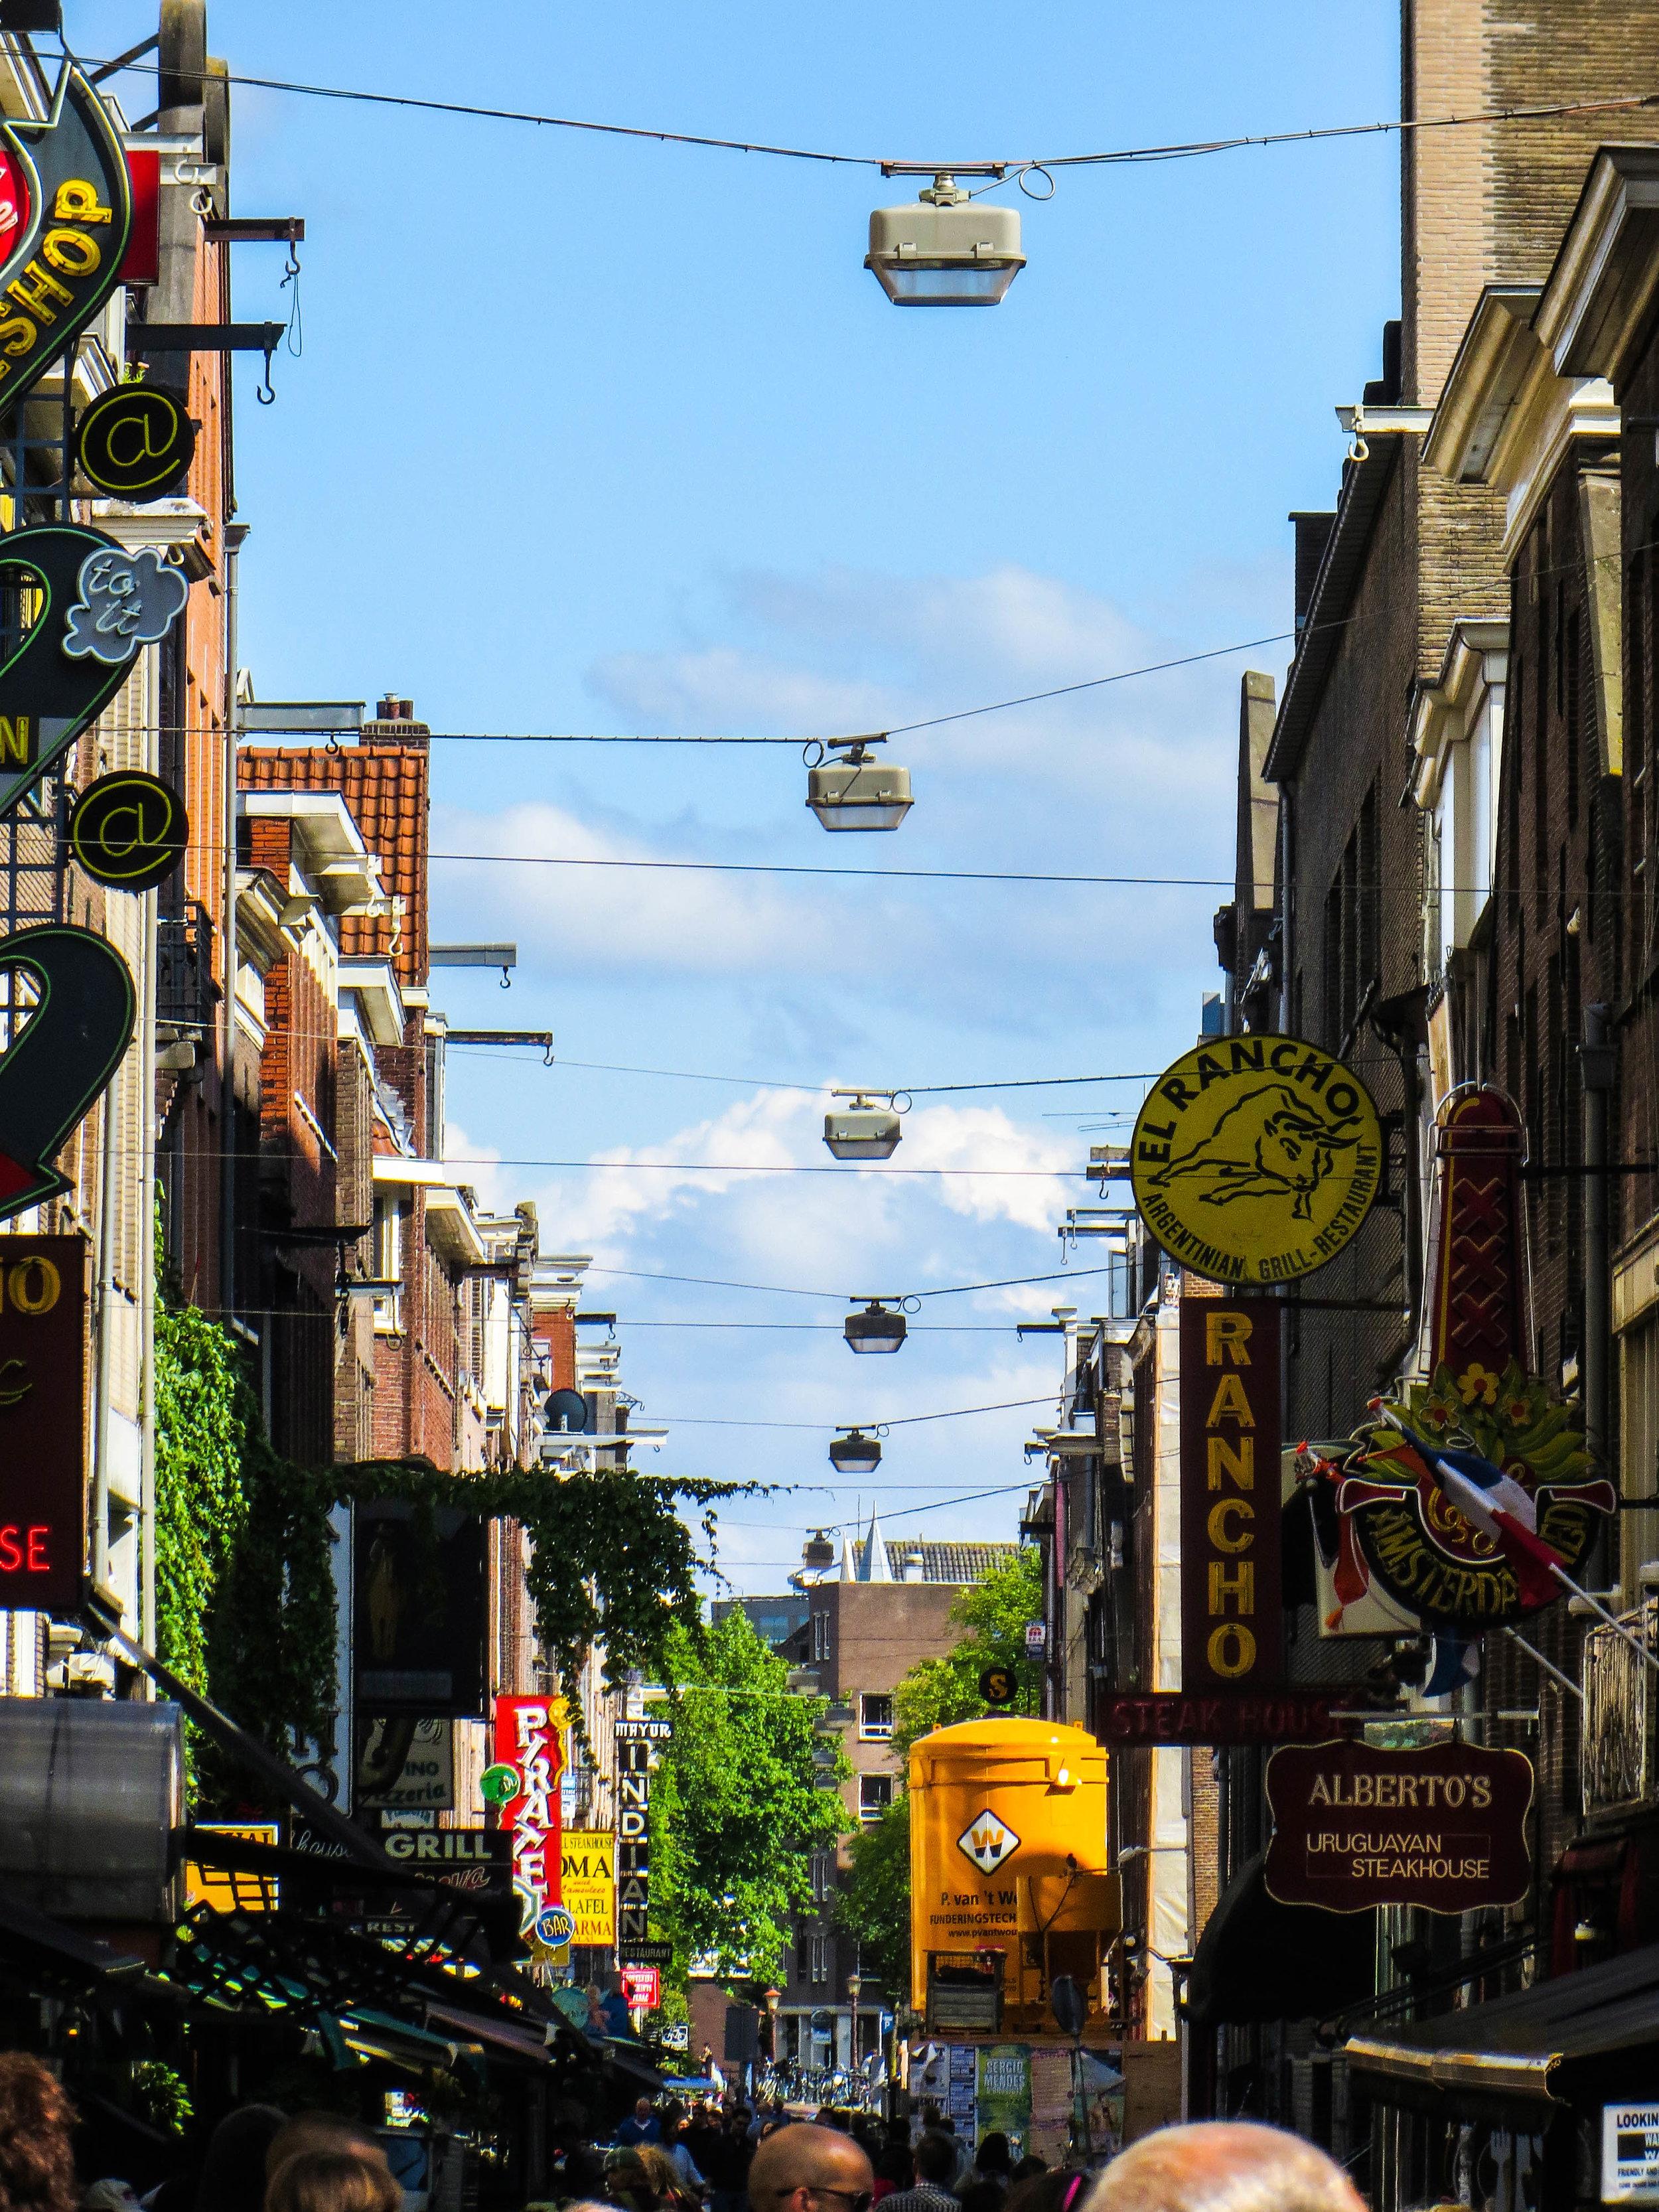 amsterdam-netherlands-street-photography-28.jpg